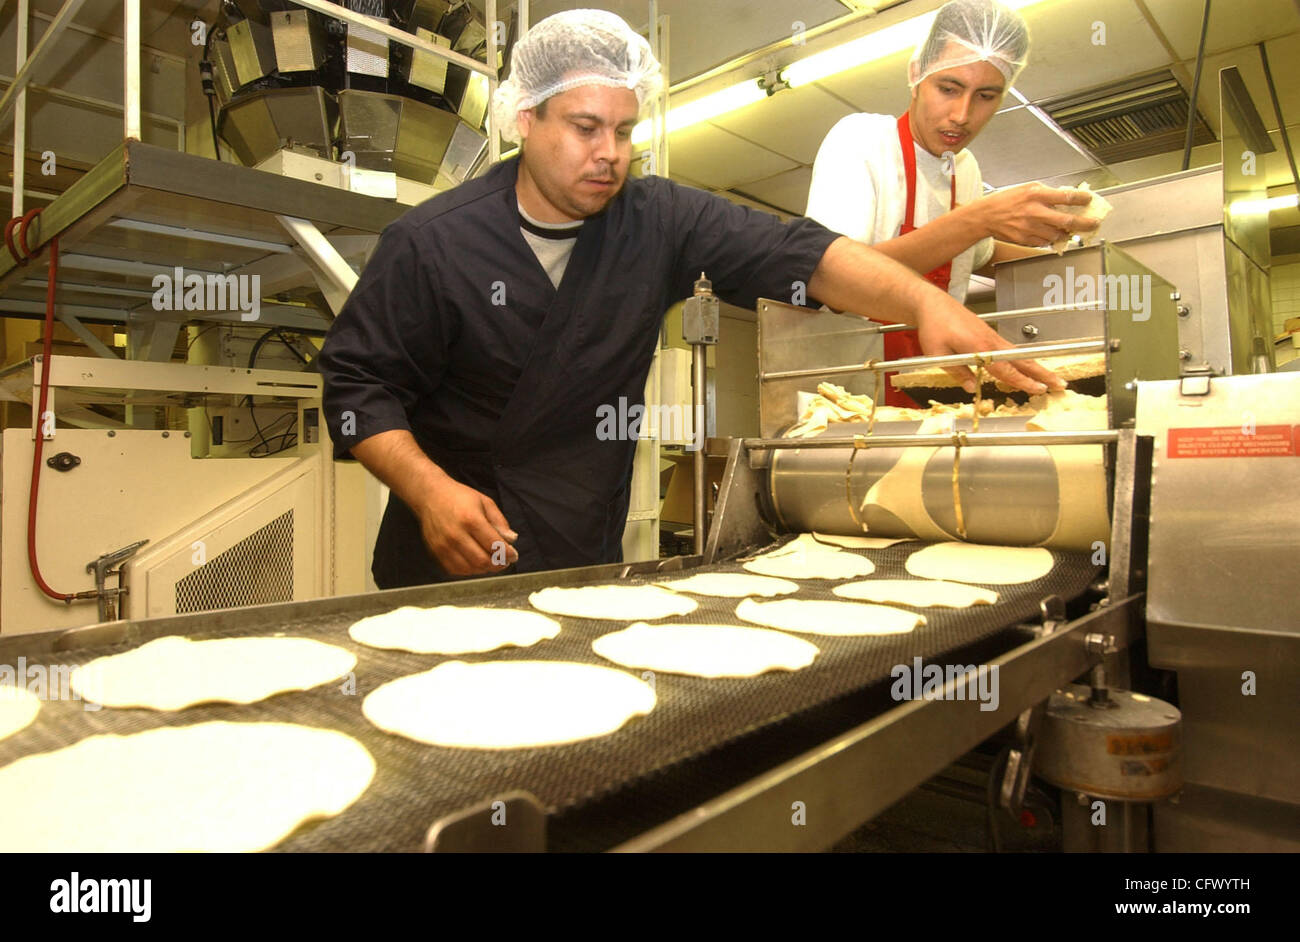 Mar 14, 2007 - Millbrae, CA, USA - JUAN VAZQUEZ, left, and Juan Carlos operate machinery that cuts tortillas at - Stock Image